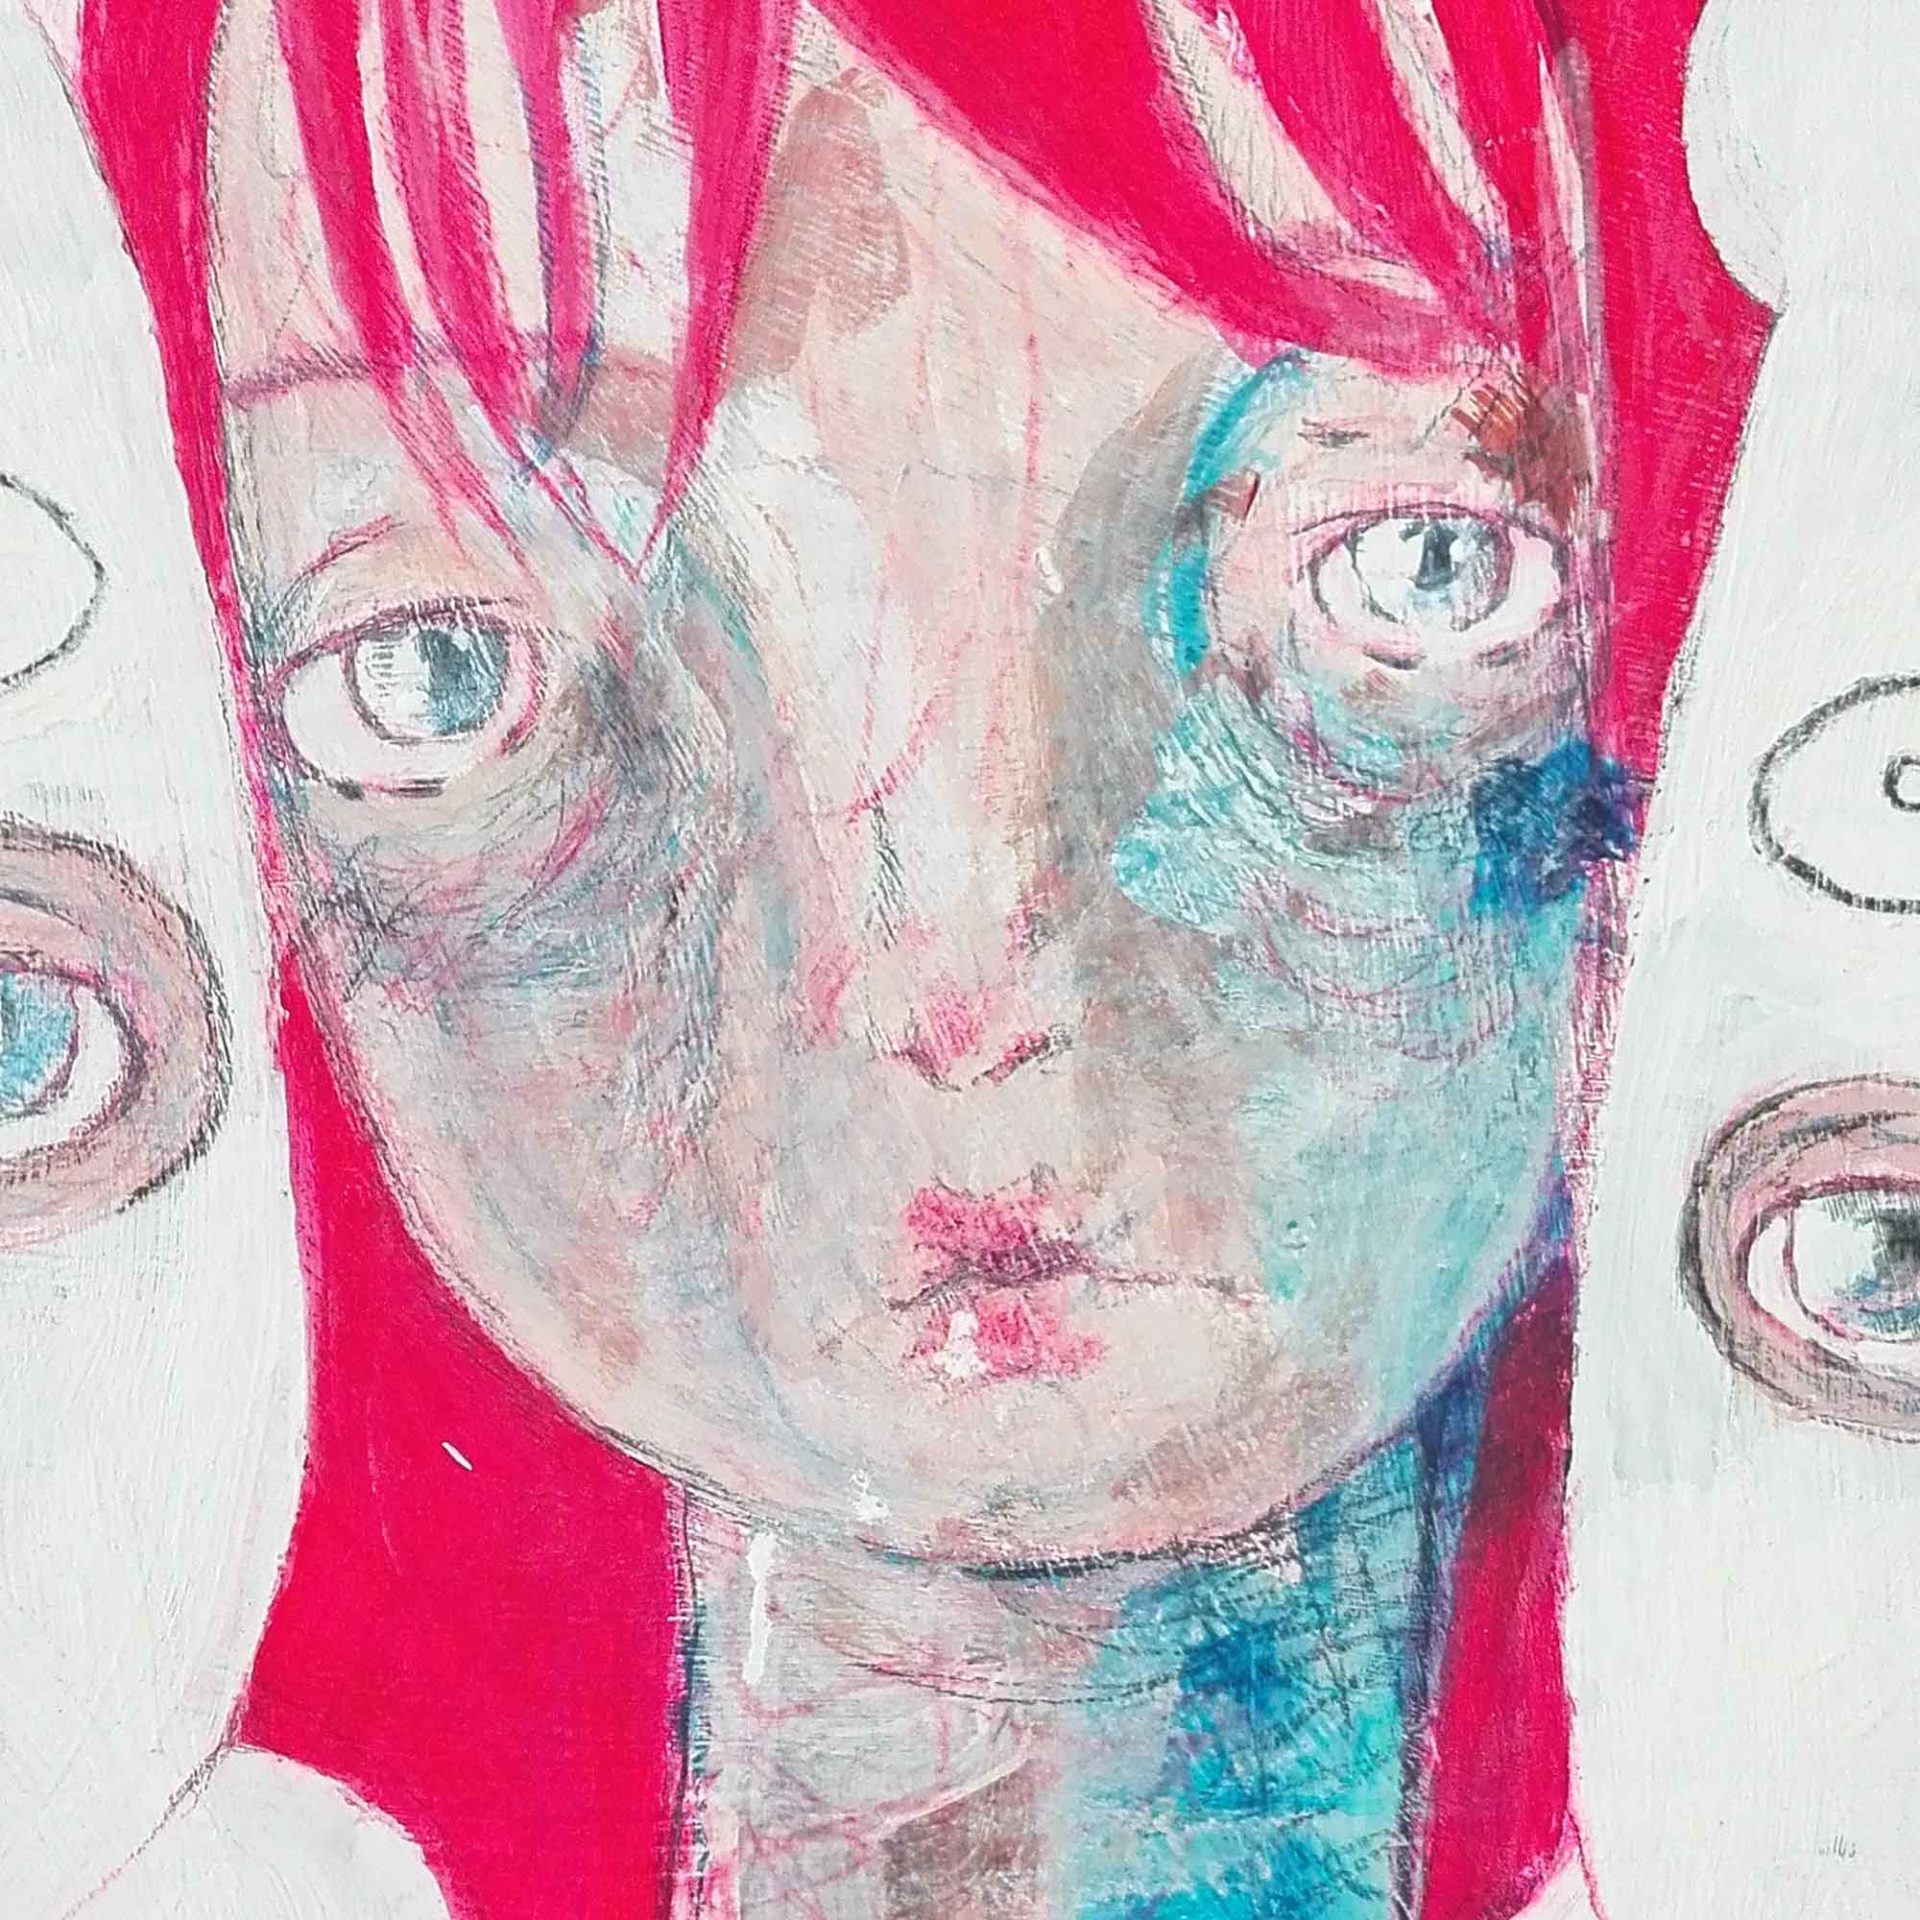 2015 Burnout Amichetti Pittura contemporanea Diego Gabriele